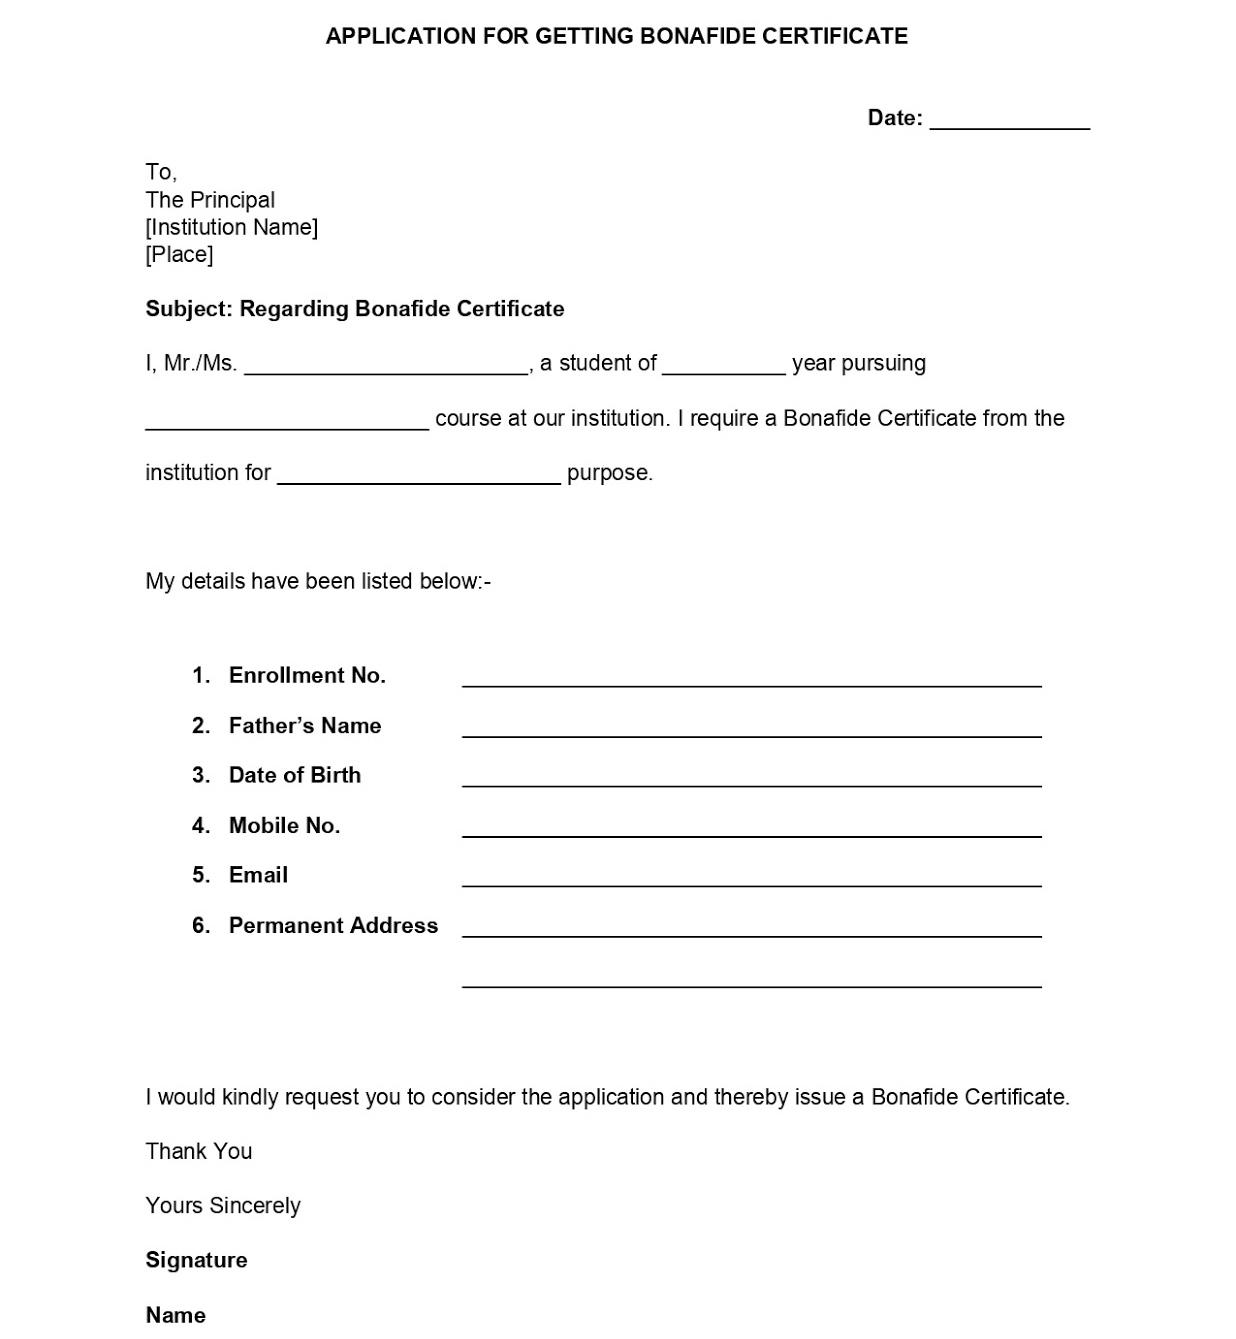 bonafide certificate application form format for students